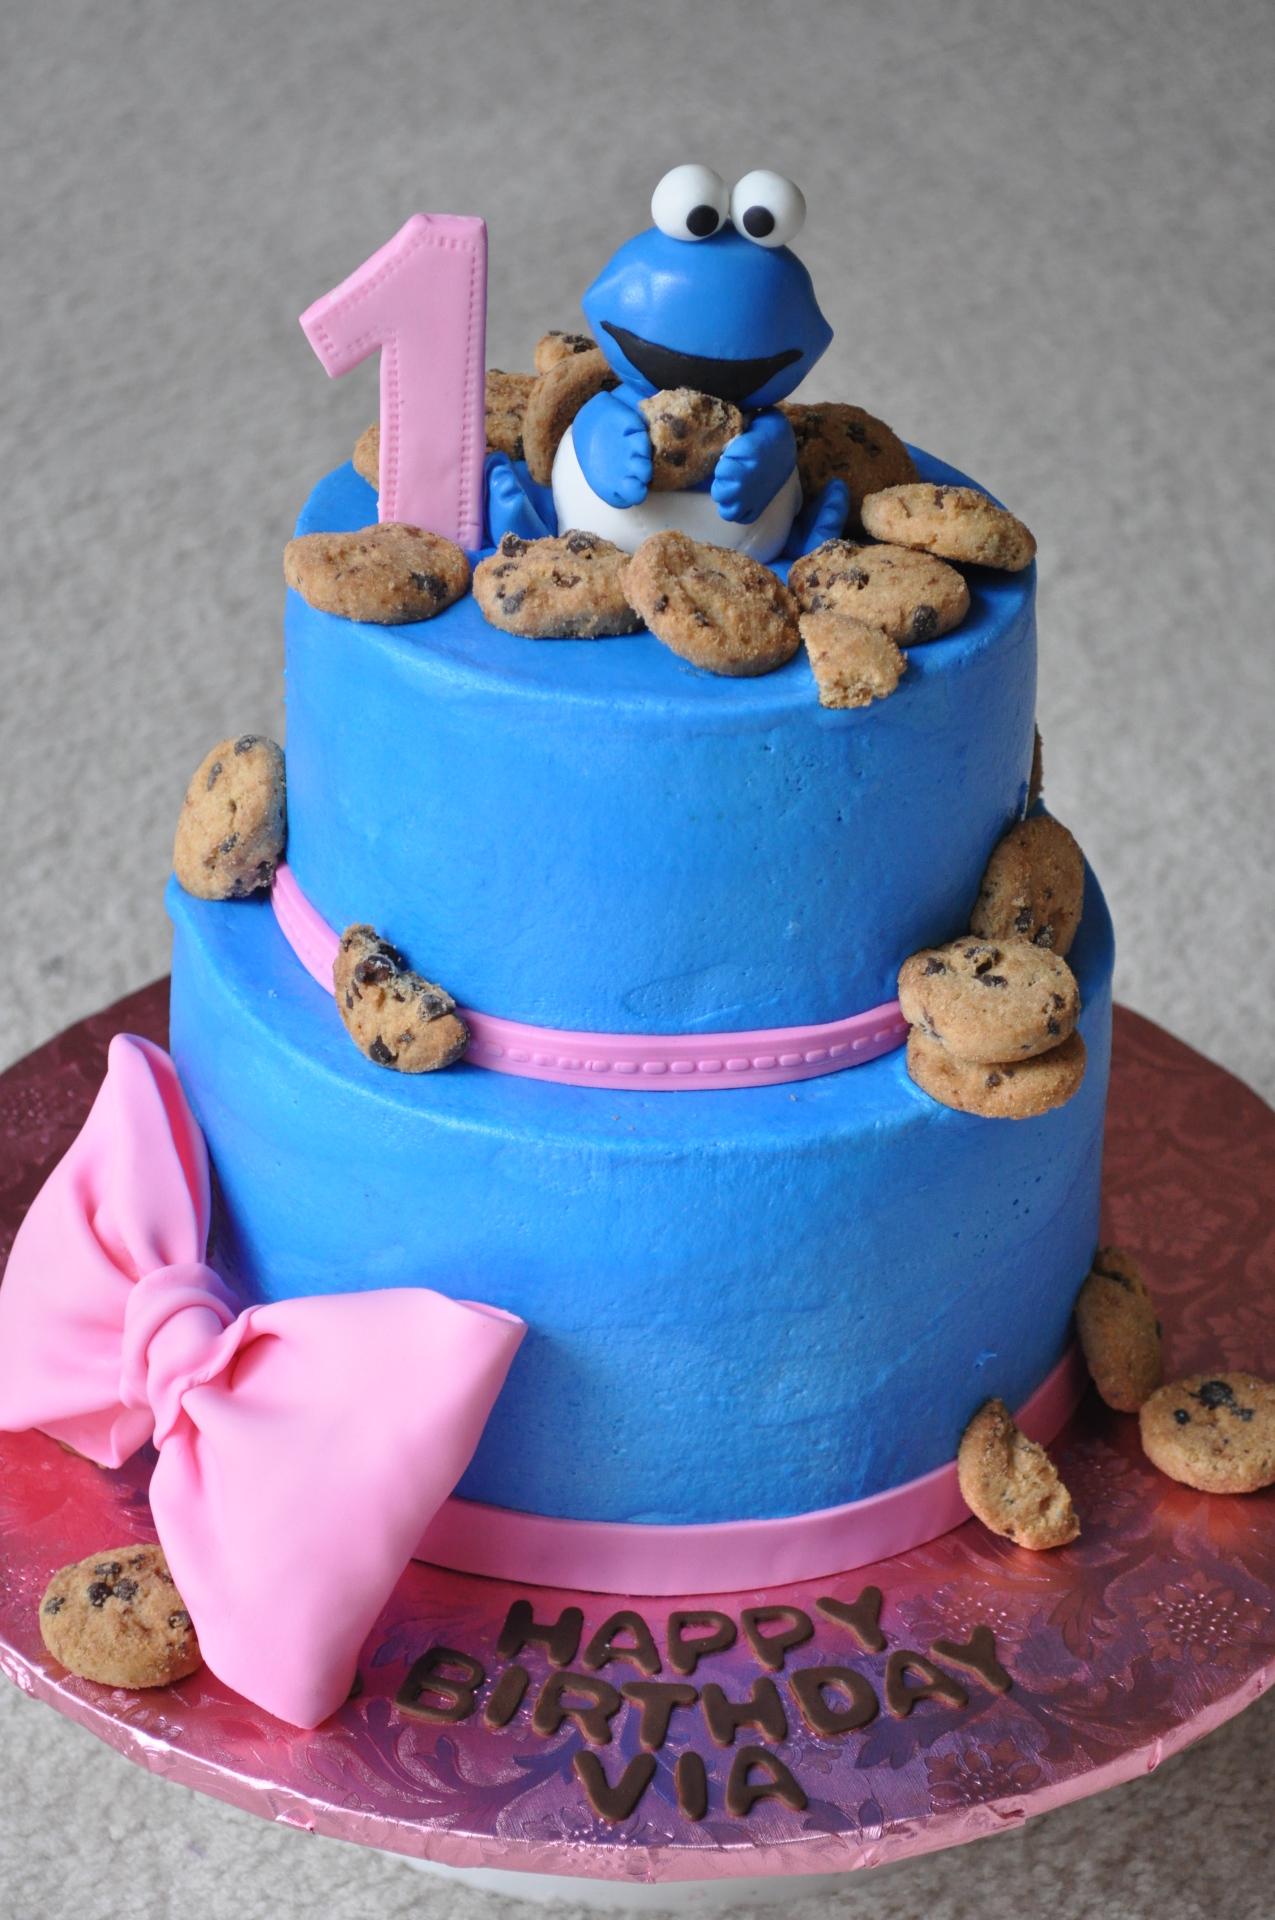 Cookie monster cake, Sesame street cake, 1st birthday cake